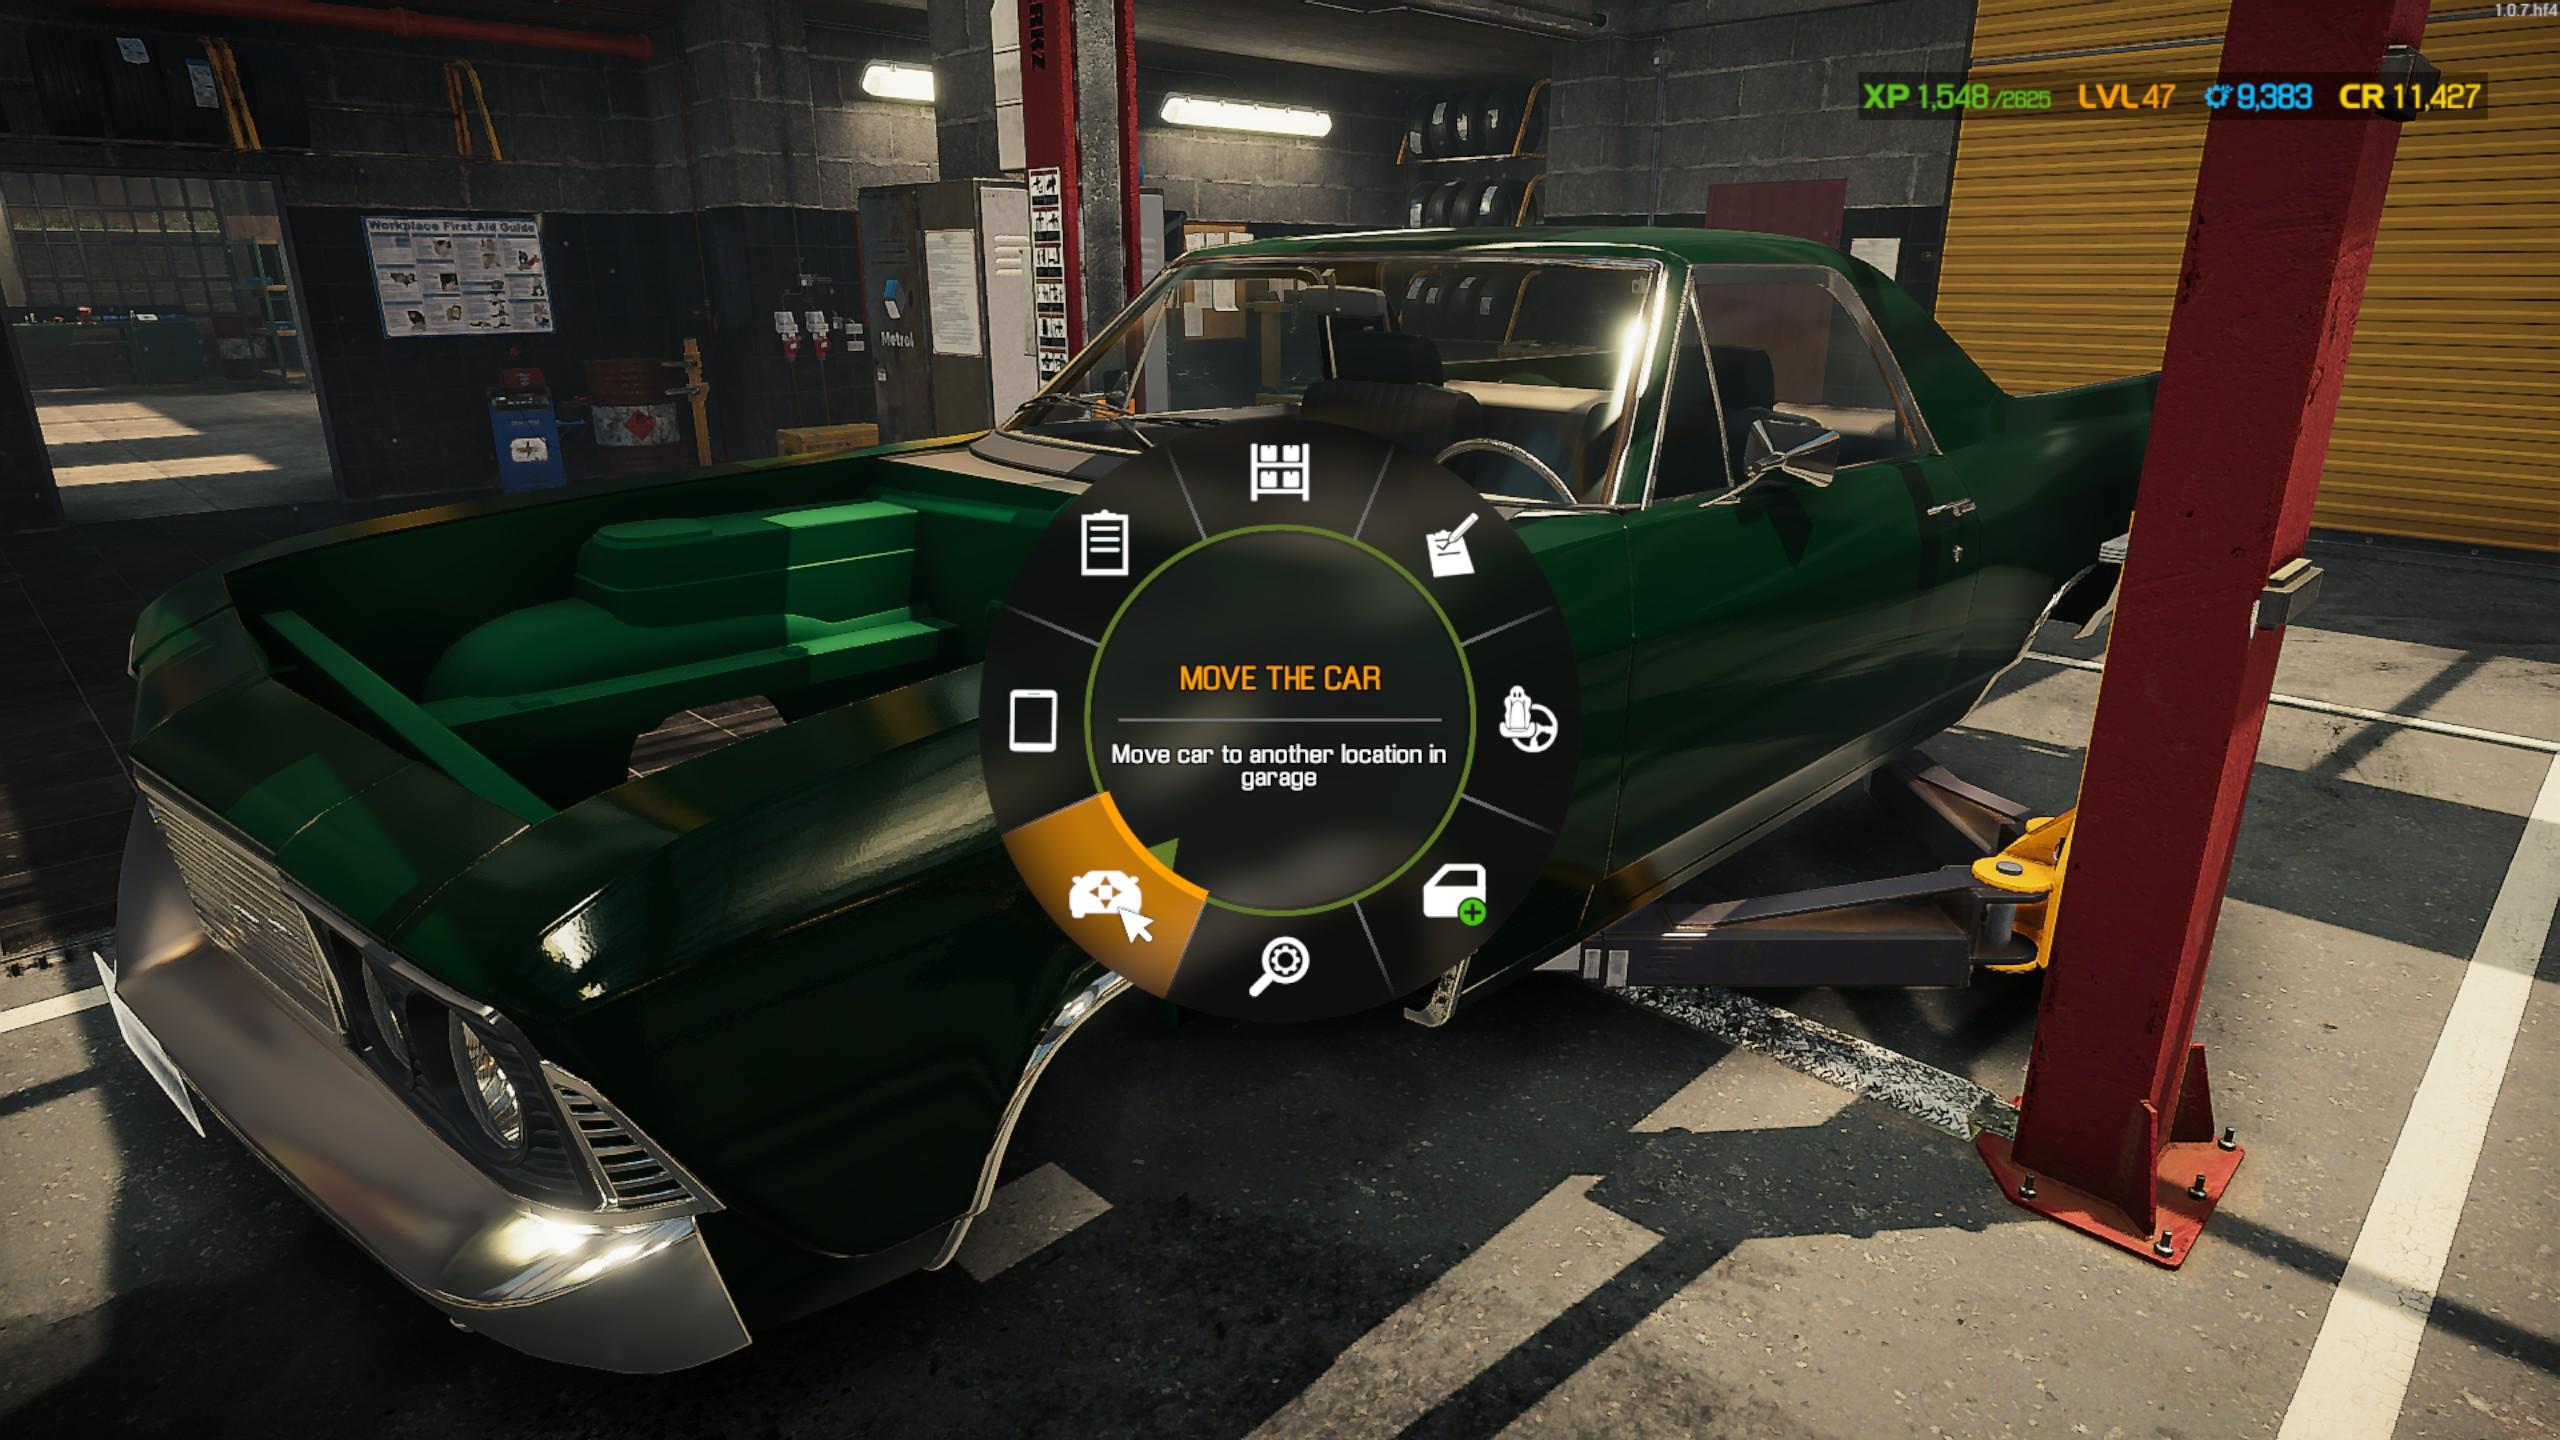 Car Mechanic Simulator 2021 - How to Colour Matching Parts in Game - Colour Matching Parts - F1C3CB4